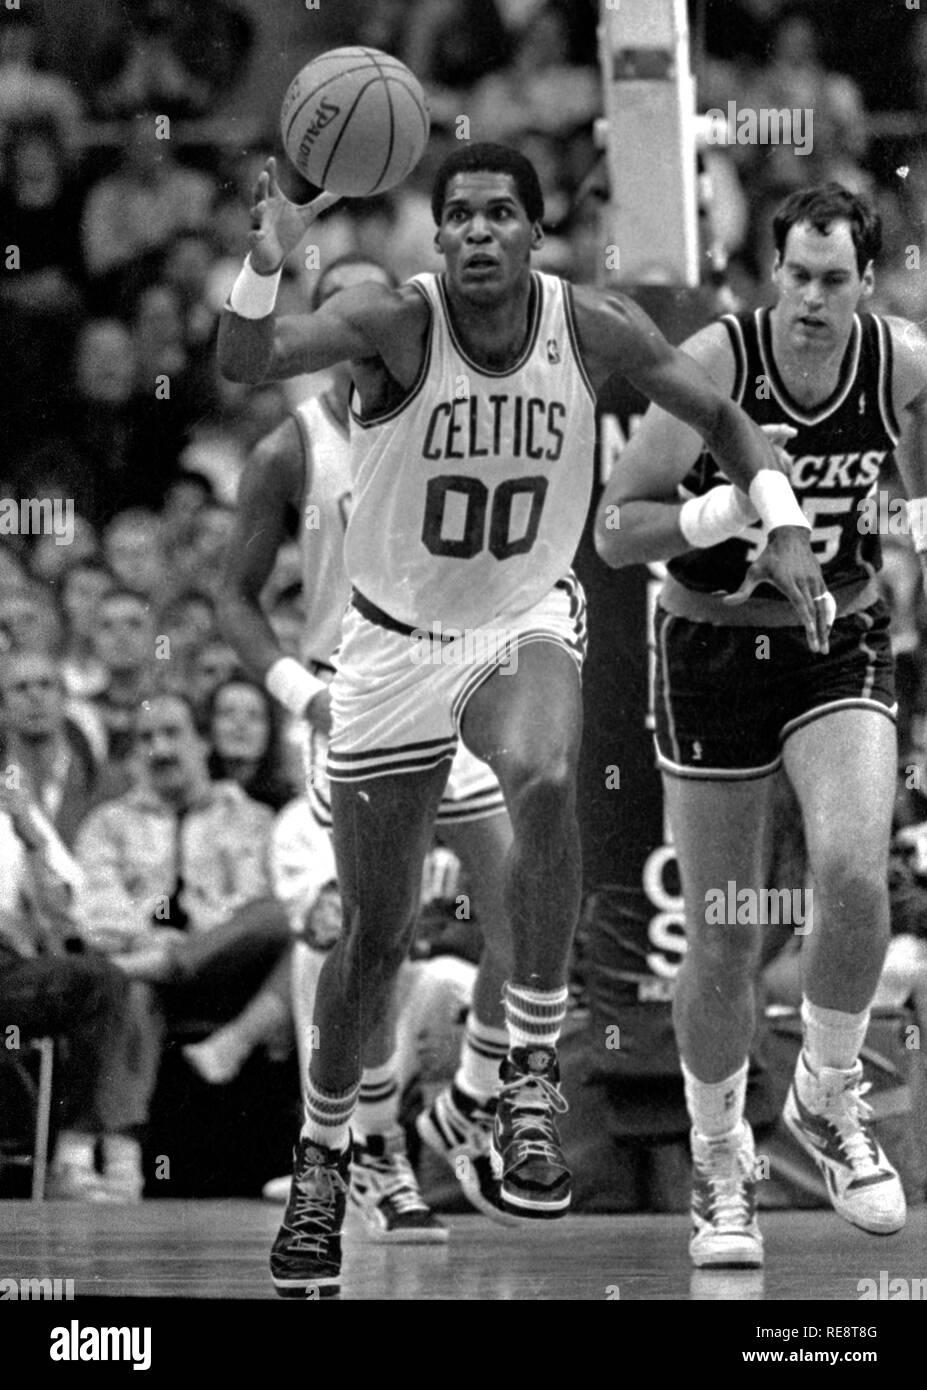 Game action Boston Celtics Robert Parish vs the Milwaukee Bucks at the Boston Garden in Boston Ma USA photo by bill belknap 1990's - Stock Image